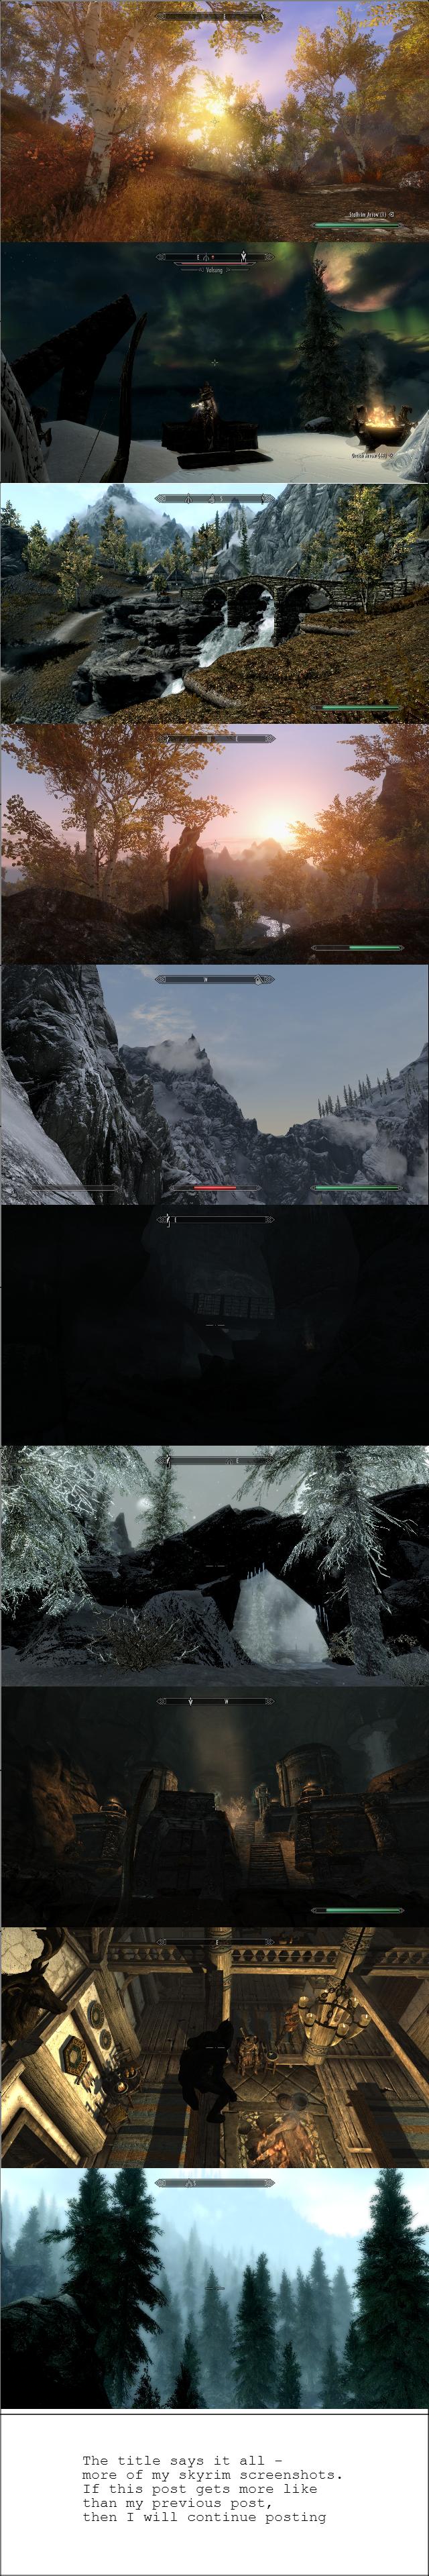 More modded Skyrim screenshots. Part 2 of my collection of Skyrim screenshots. I run quite alot of mods. Mod list: IncreasedGrassDensity StaticMeshImprovement S Skyrim Modded Sc